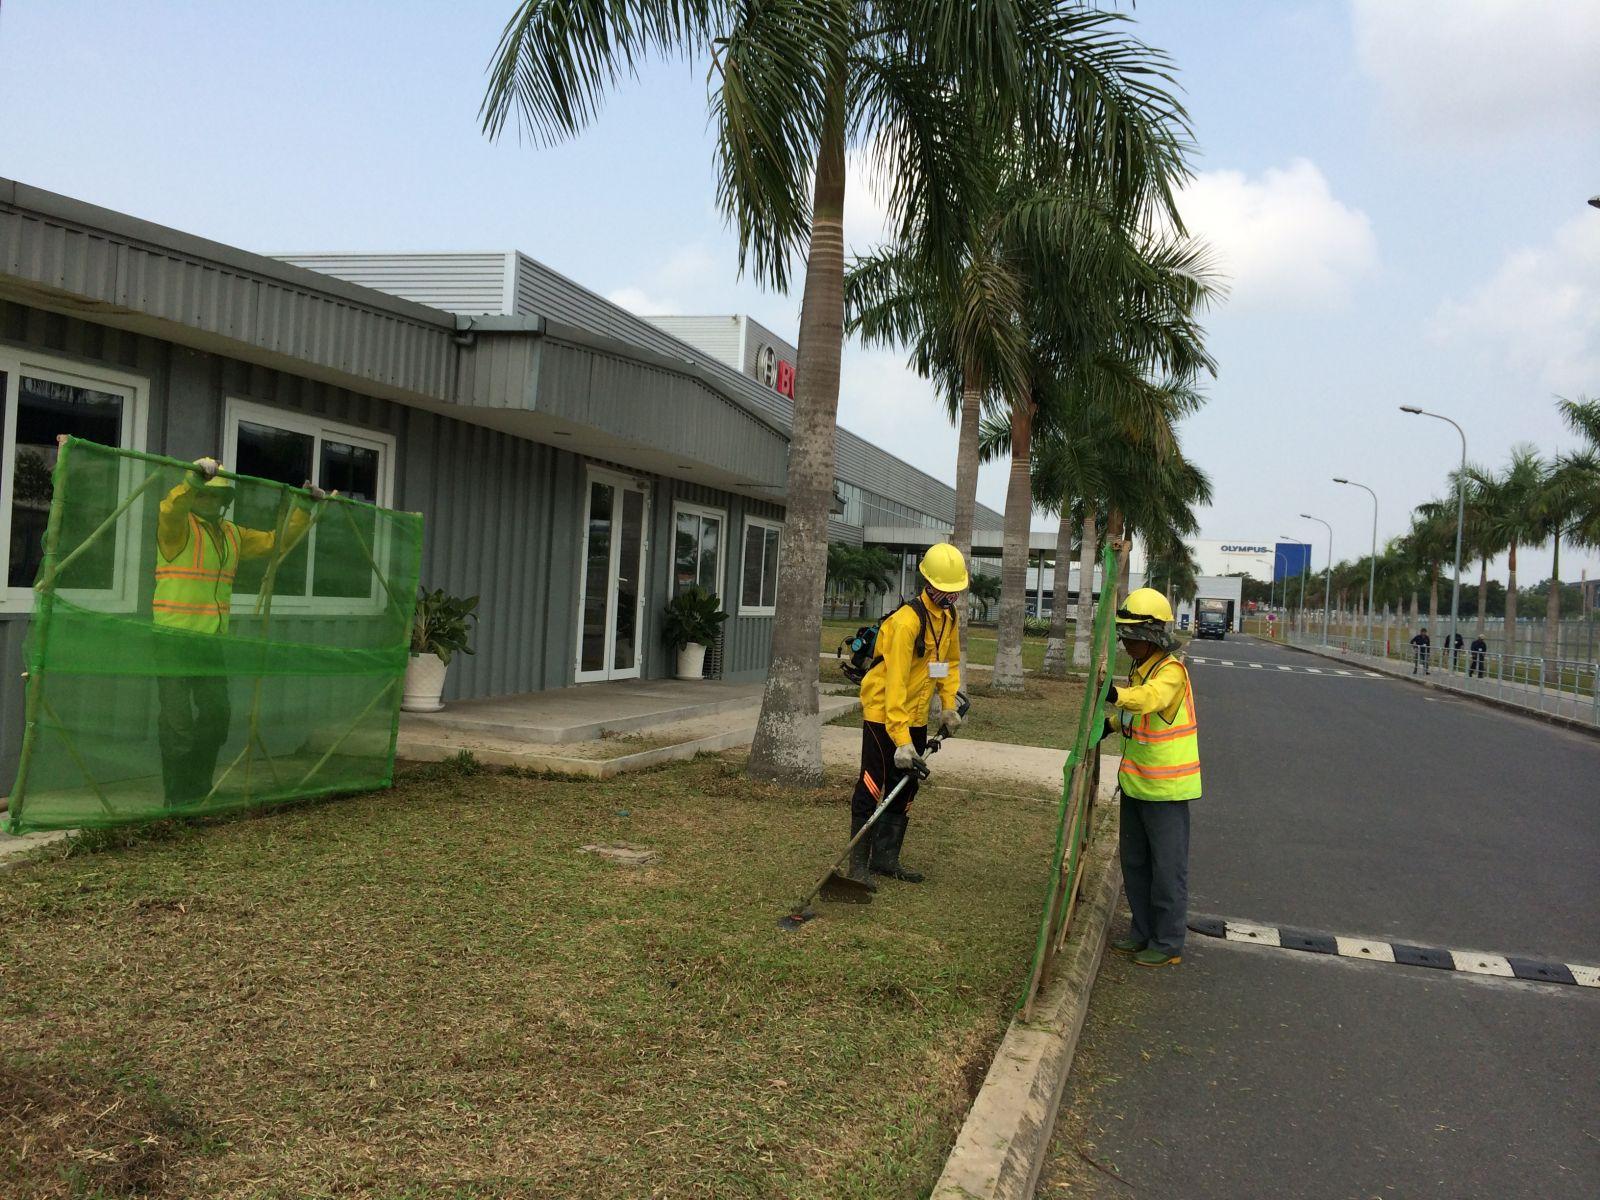 Dịch vụ cắt cỏ ở TP HCM